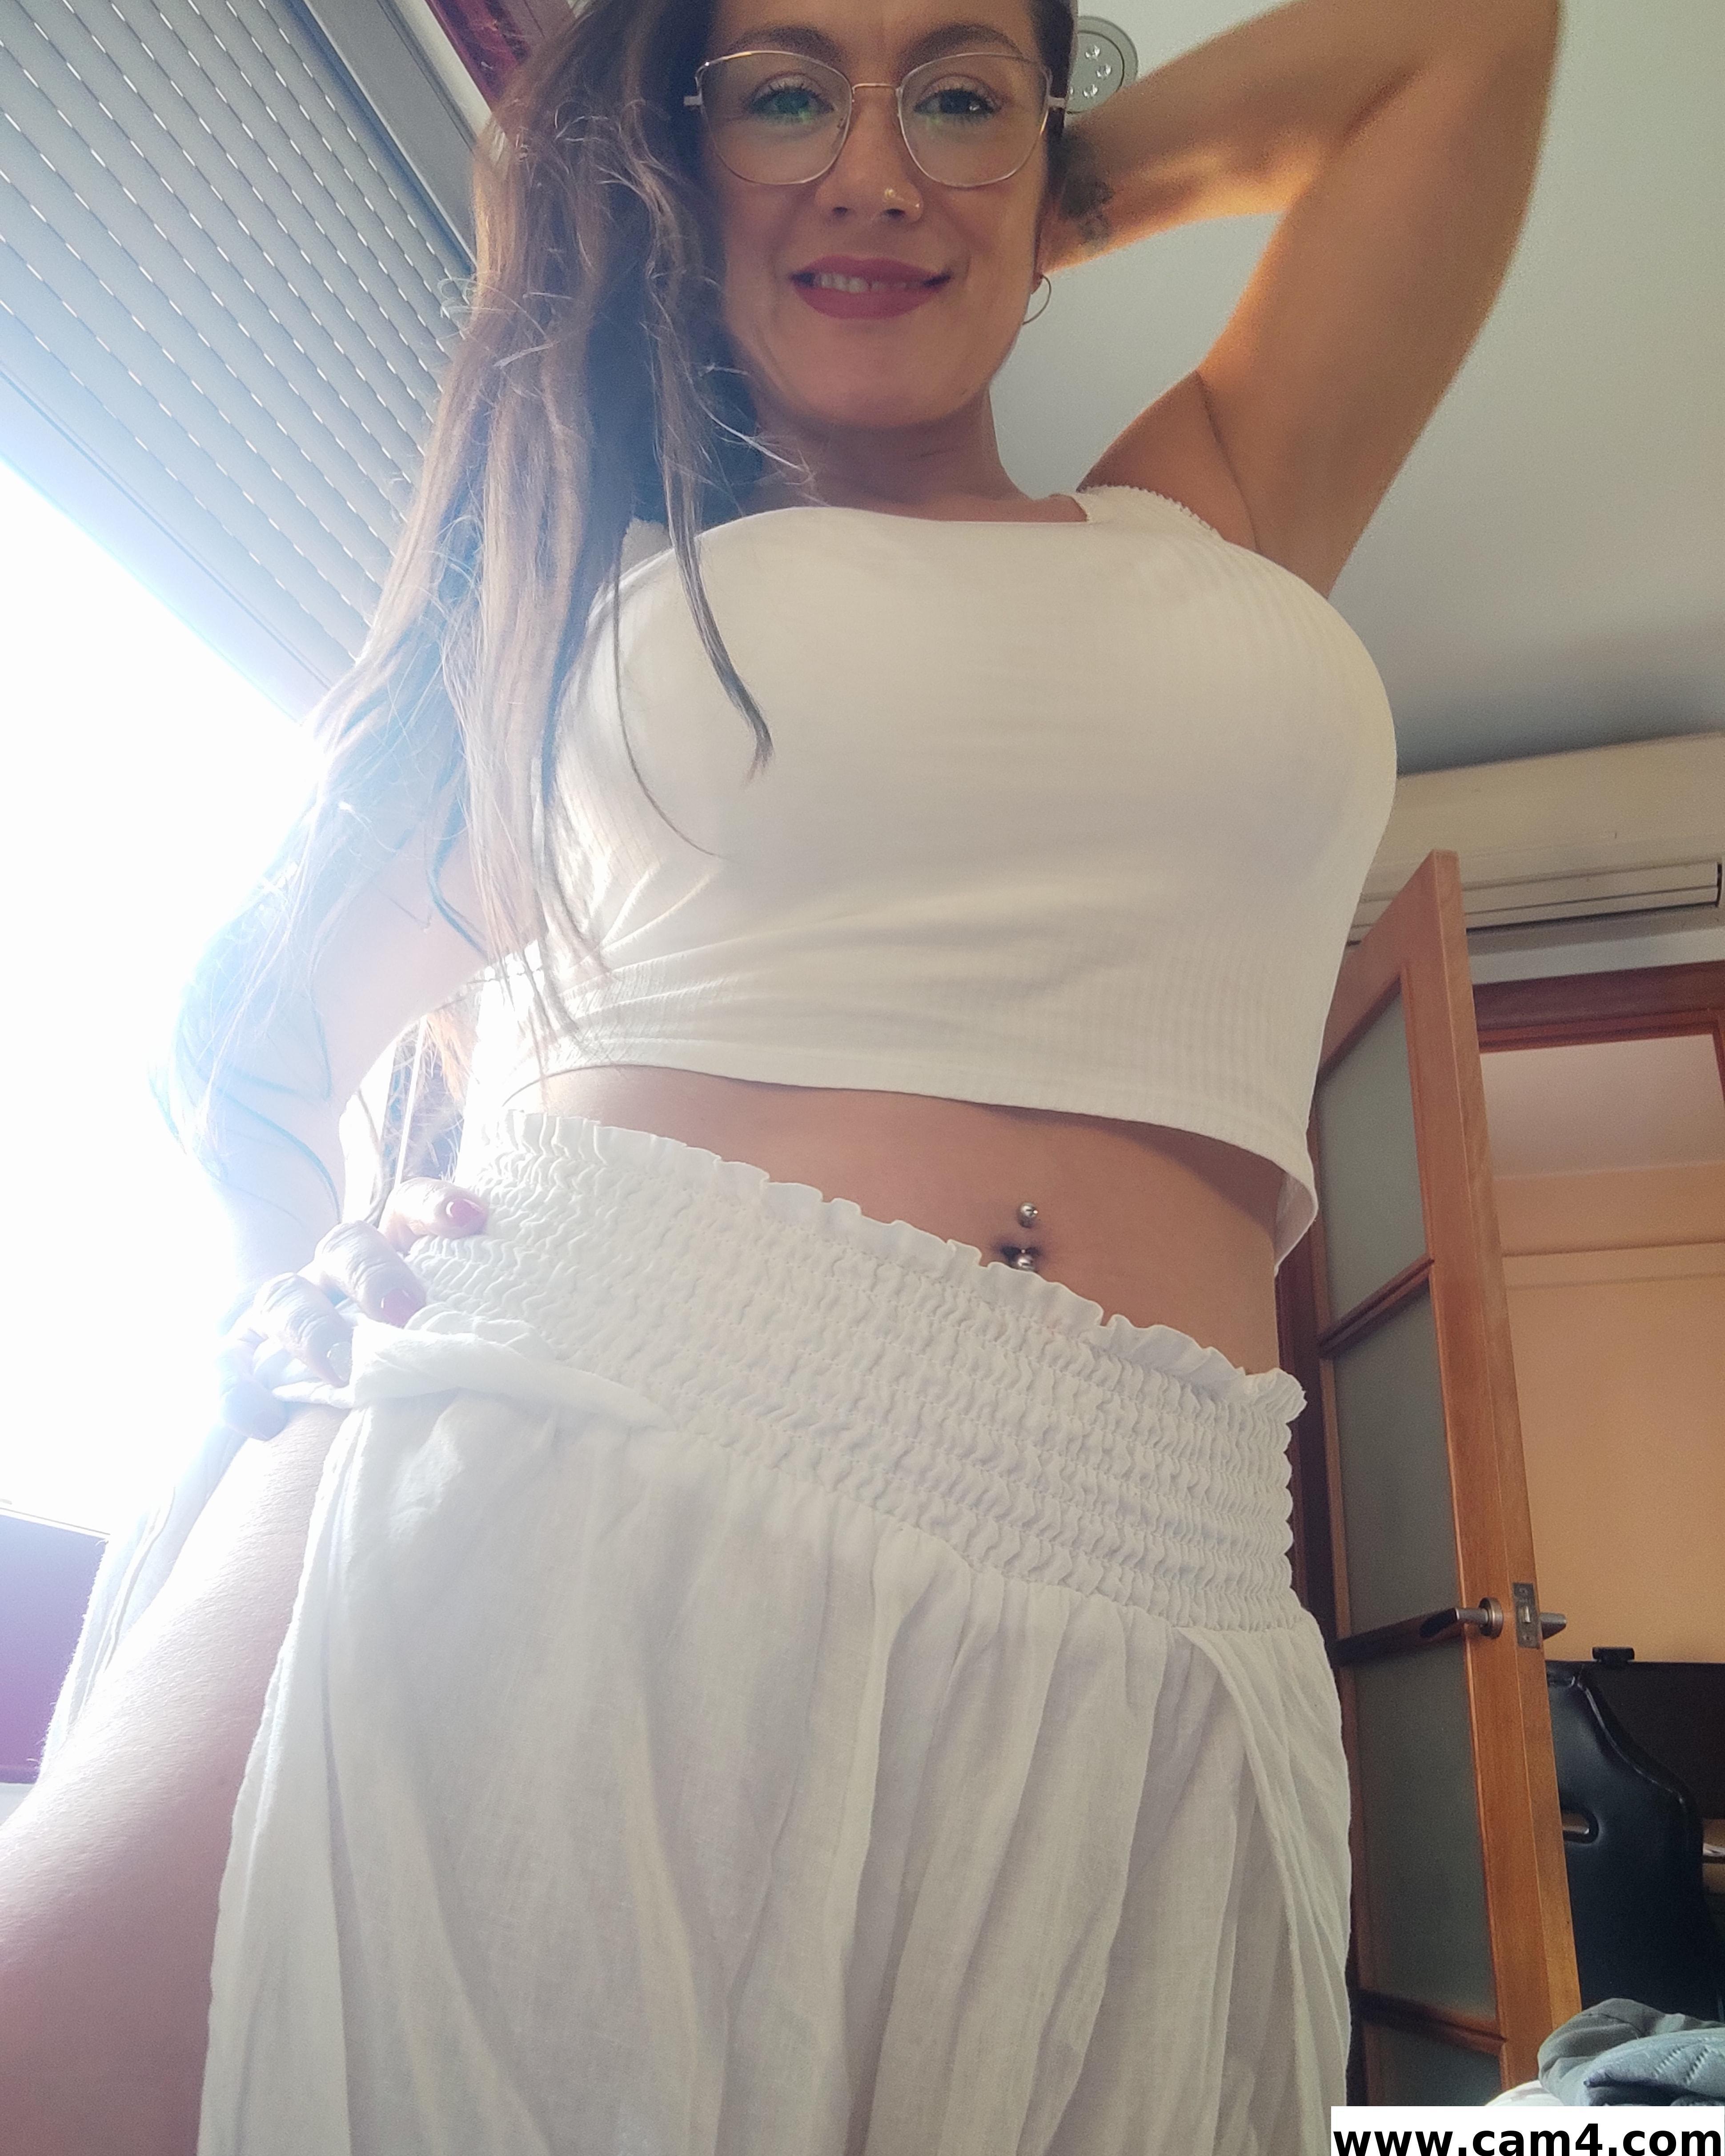 Angelita81?s=lg+2ra2jvmac+nkwwbez8ruk49v5mrke3y6jr1+mkem=